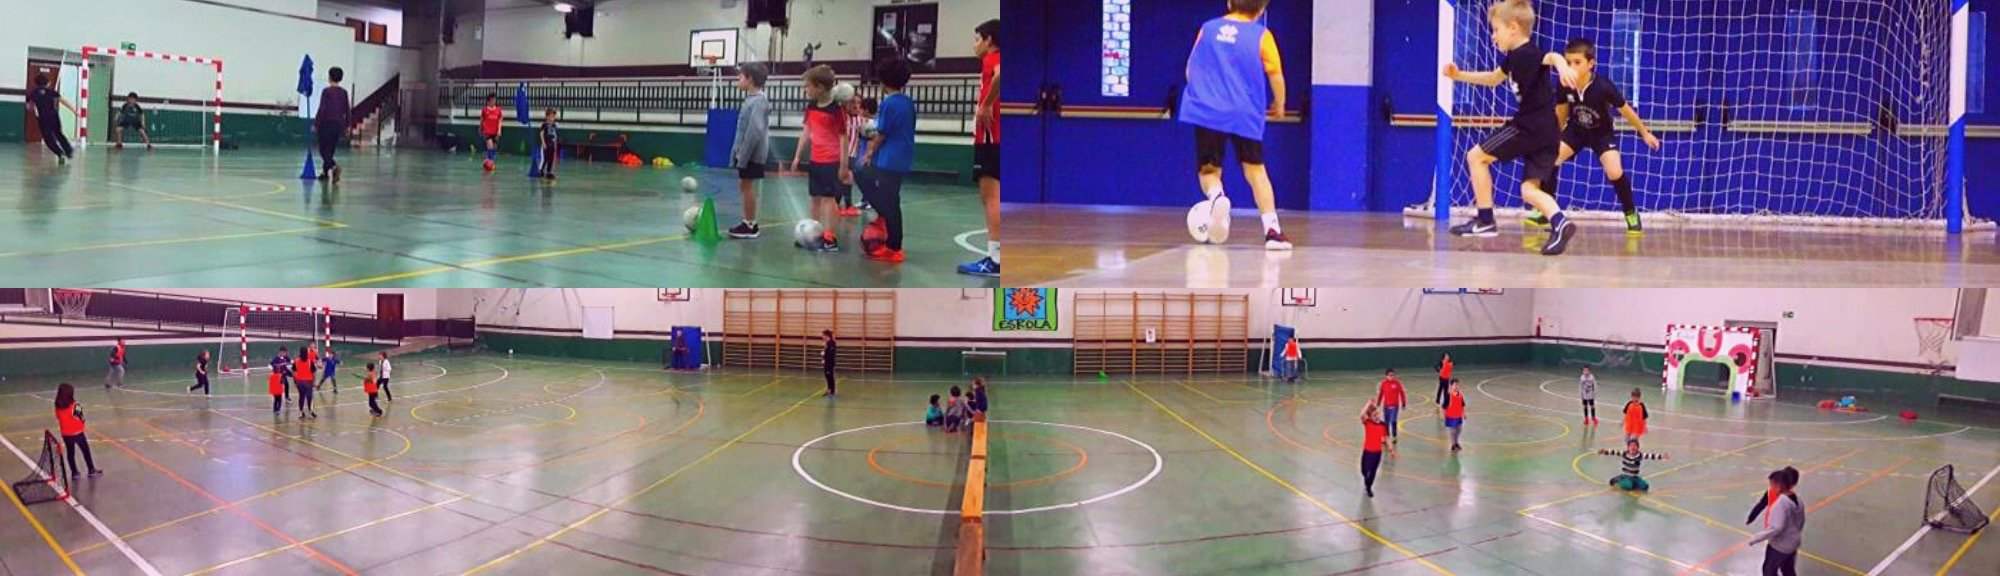 Futsal en Escolapios